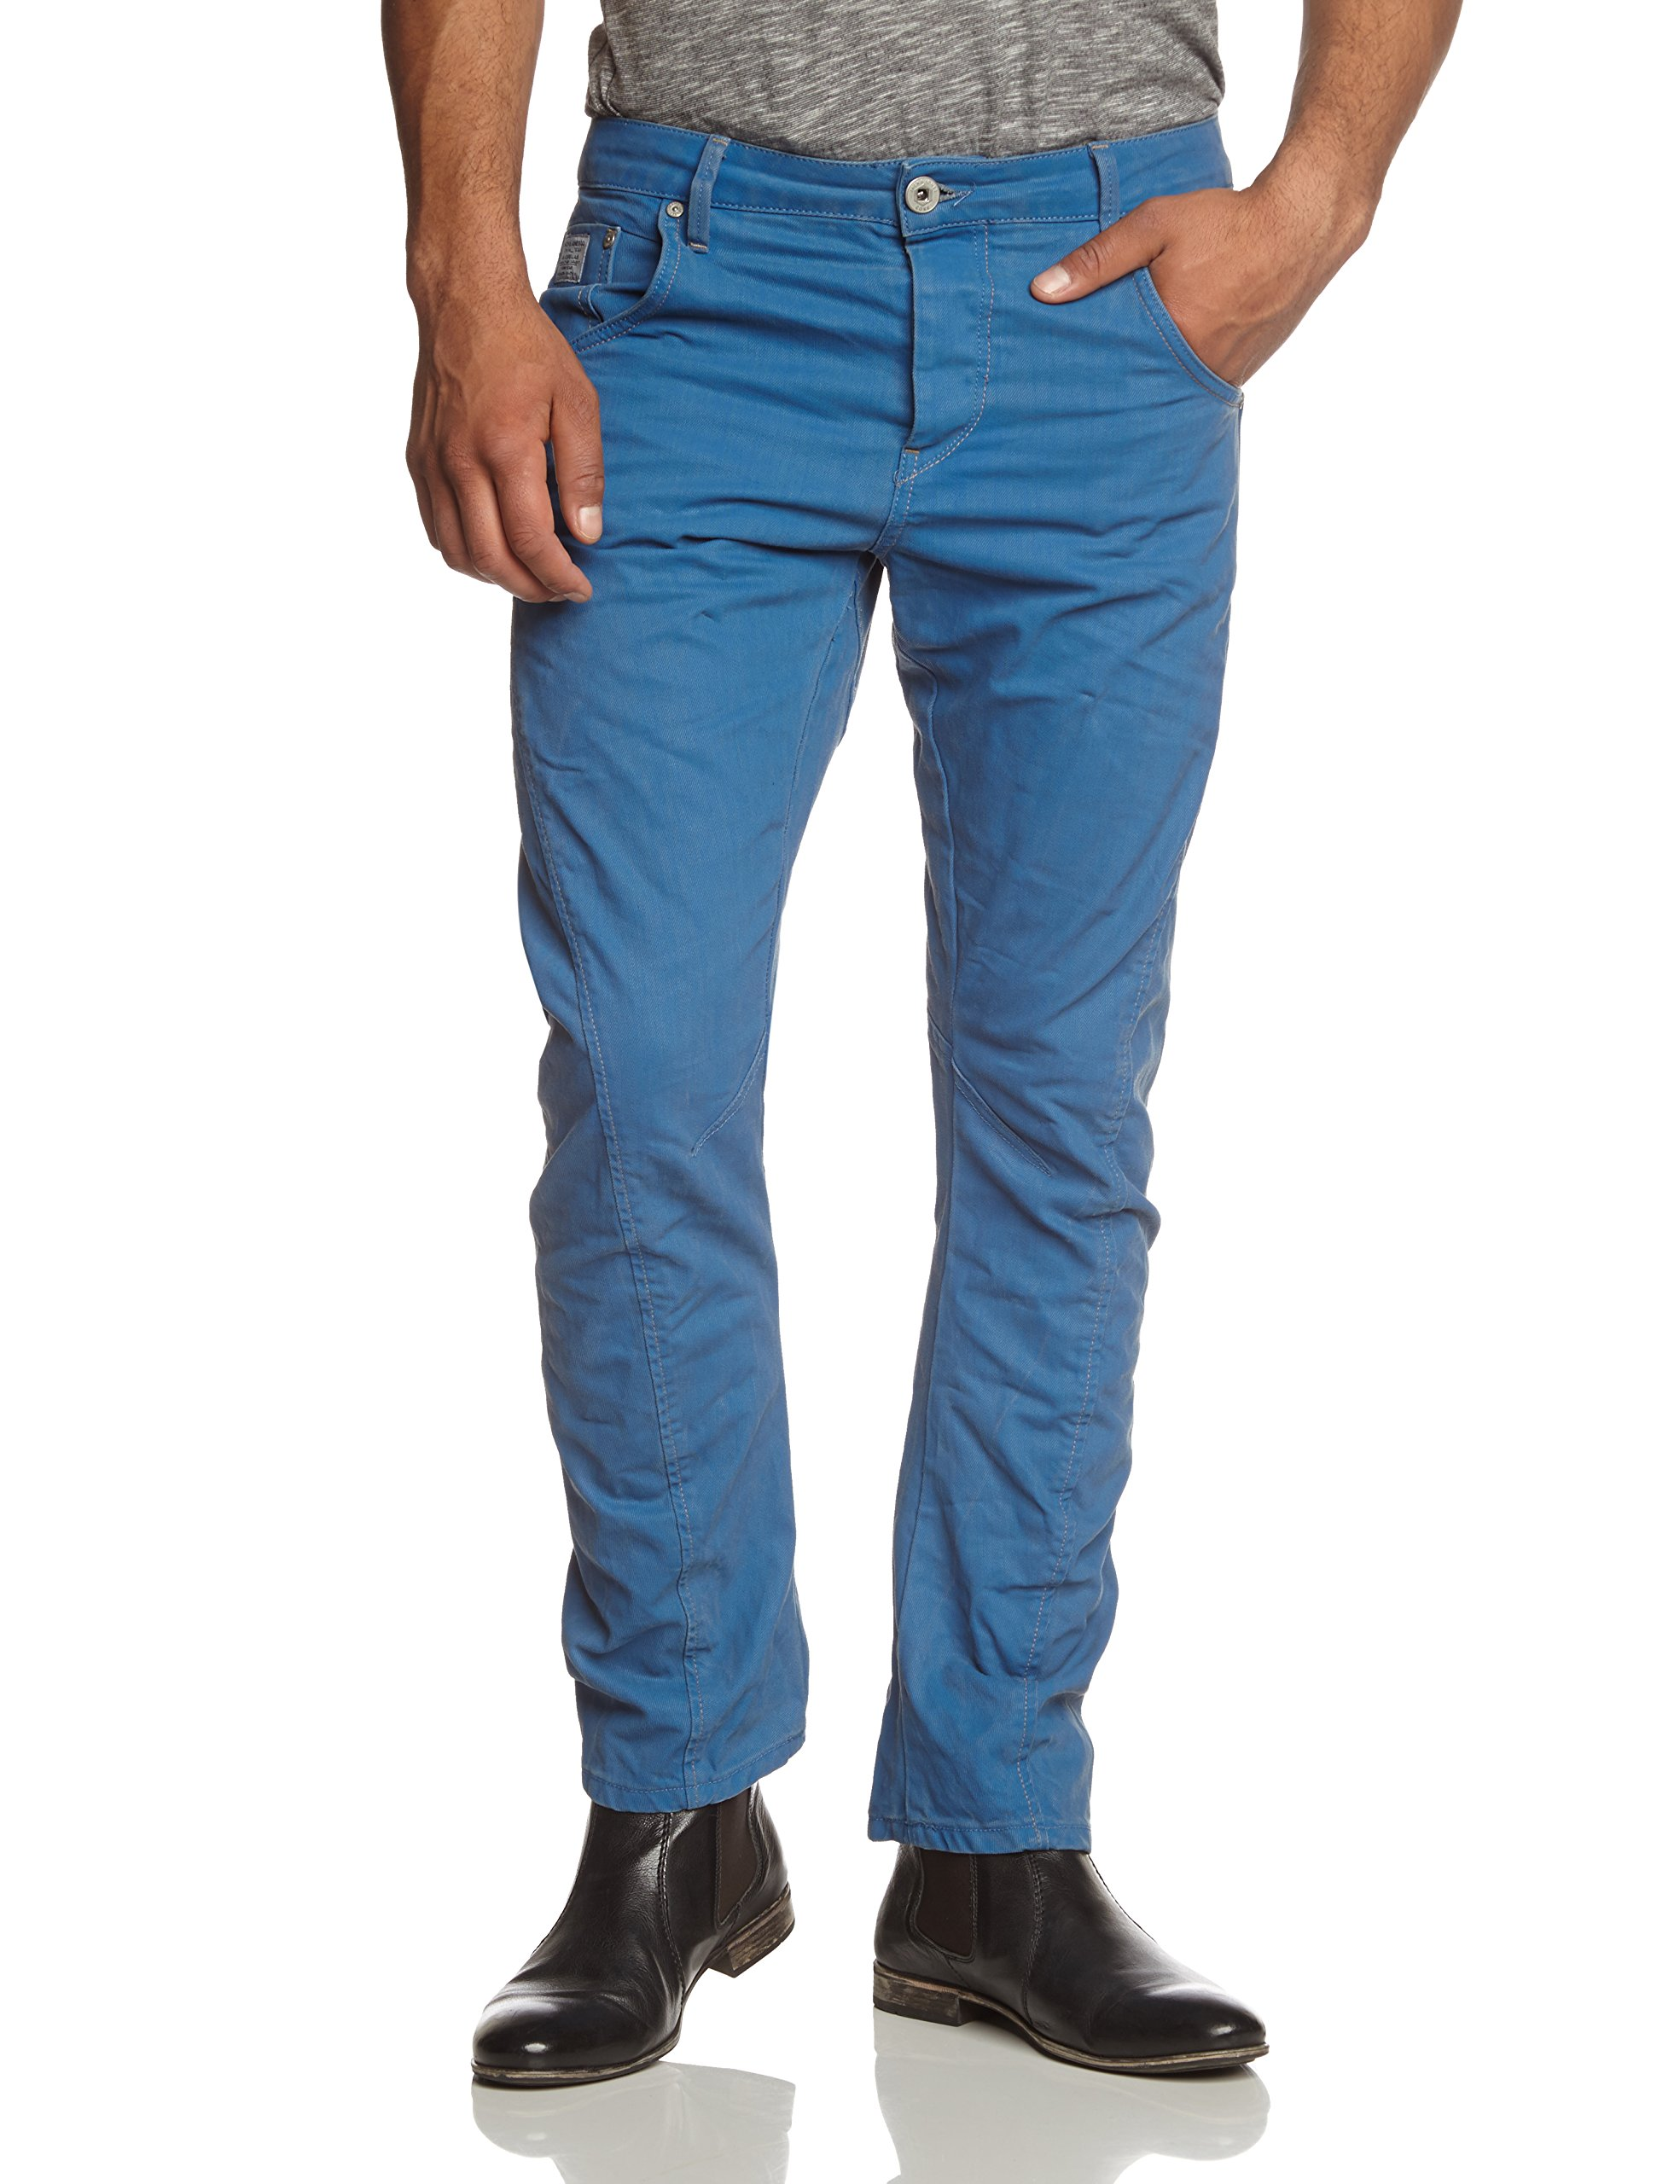 Jones 8 Core Stan X 13 JeansBlaupalace Blue28w Jackamp; 32l 9 Homme Twisted Jos 7 Jcl3FTK1